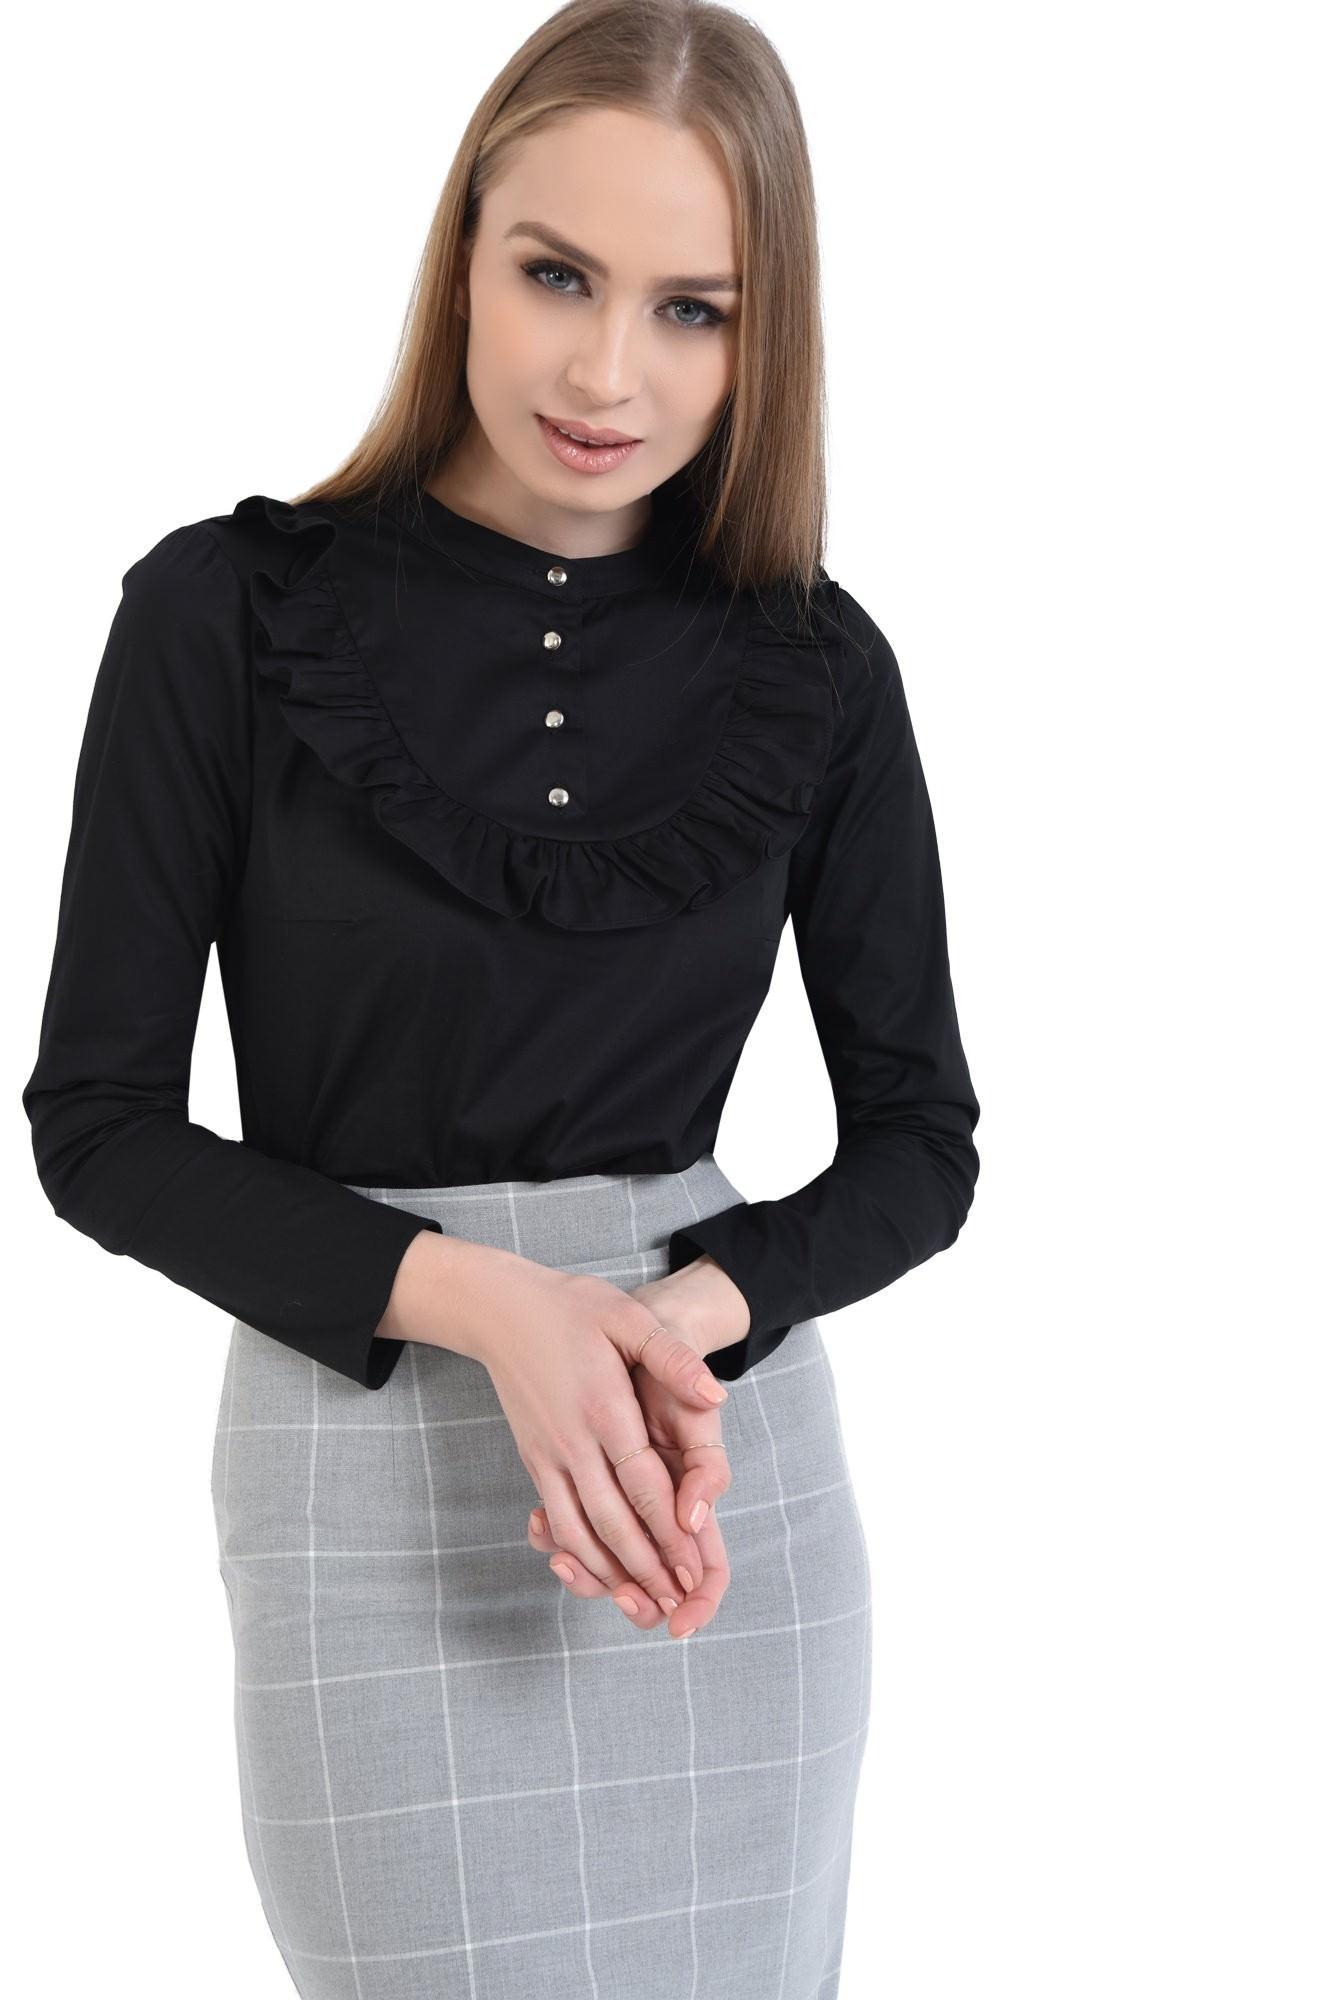 0 - Bluza casual, negru, bumbac